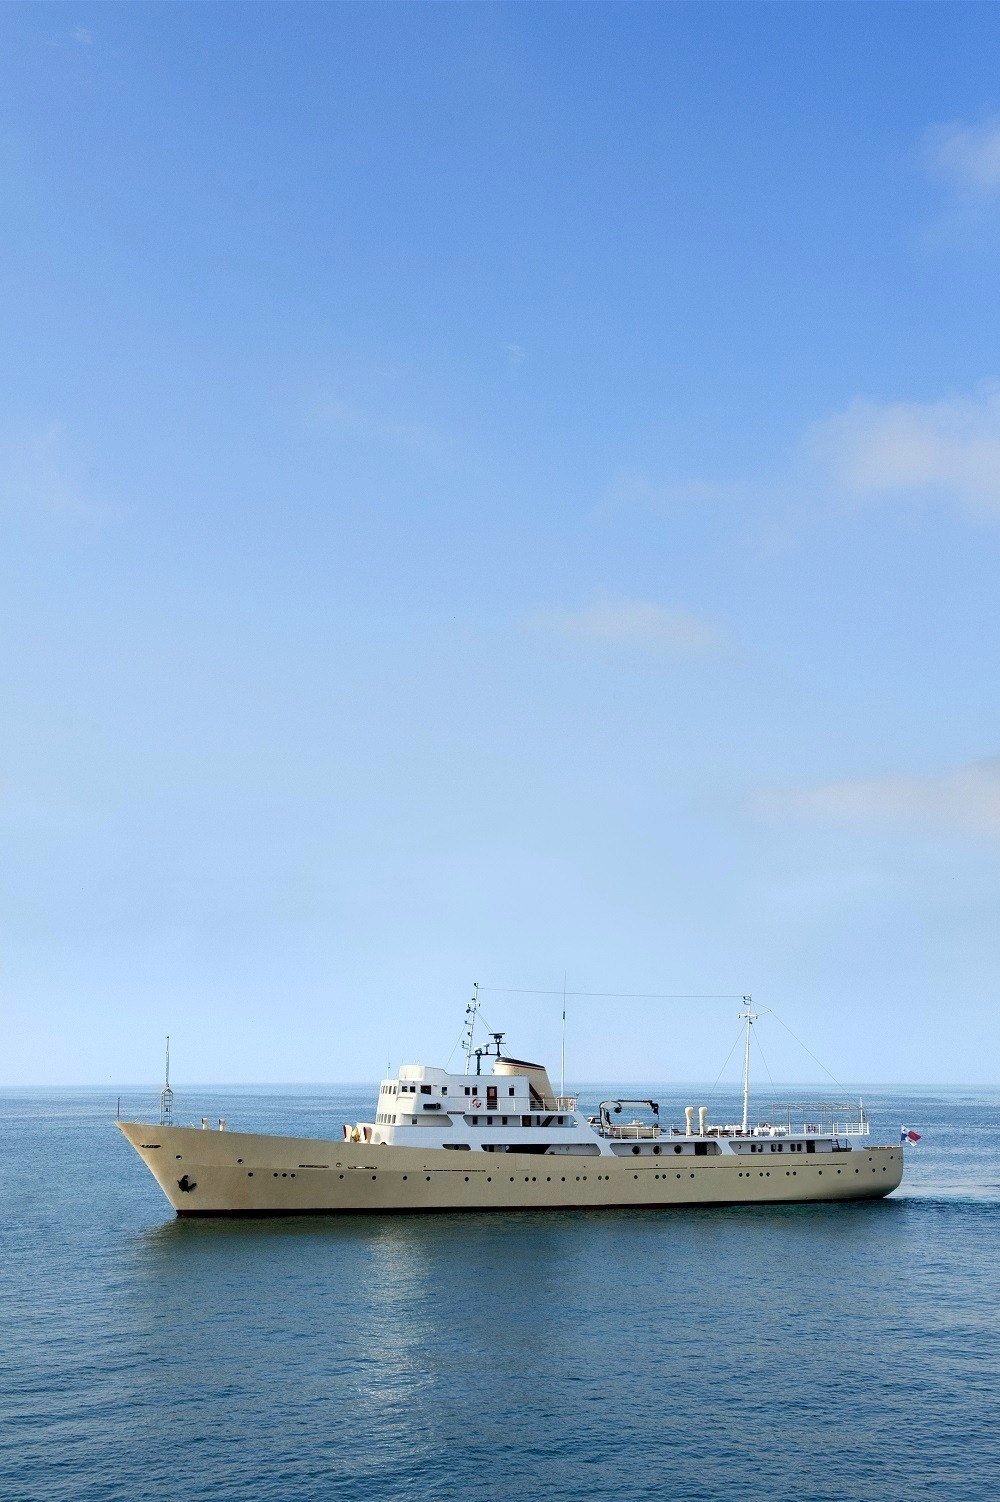 The 65m Yacht LA SULTANA